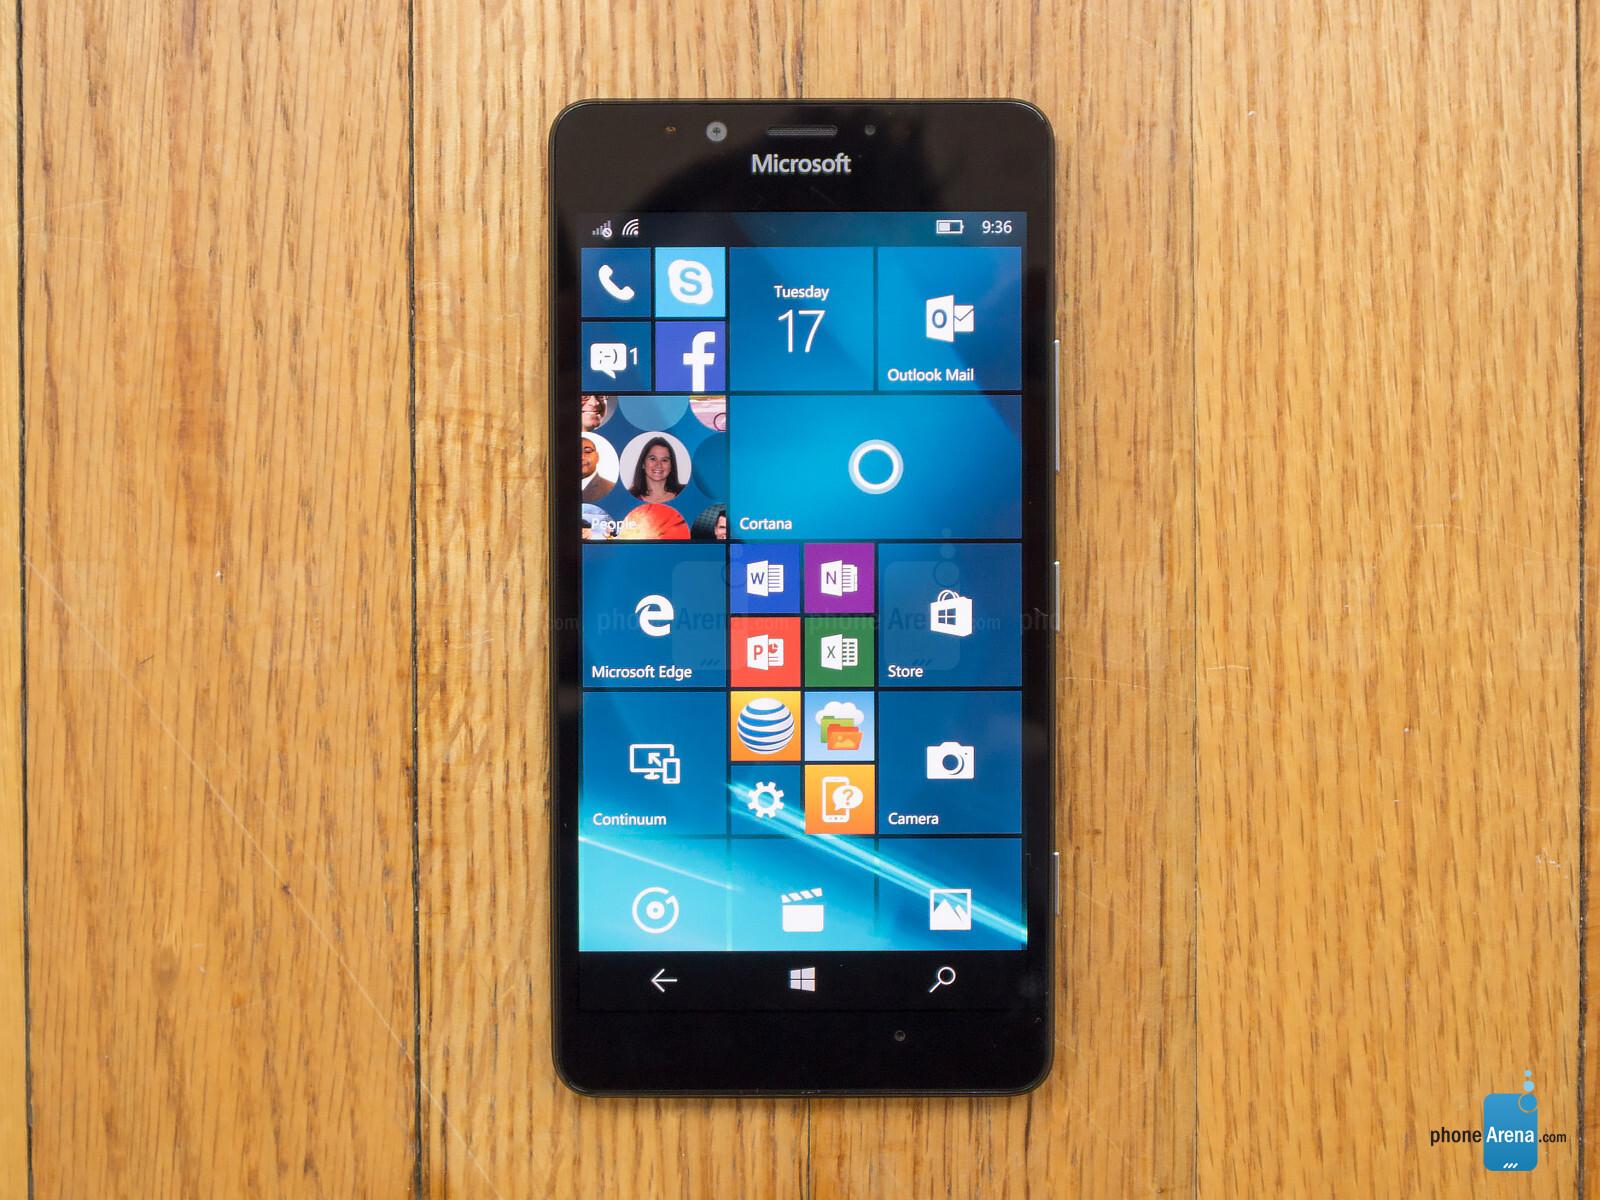 Microsoft's Lumia